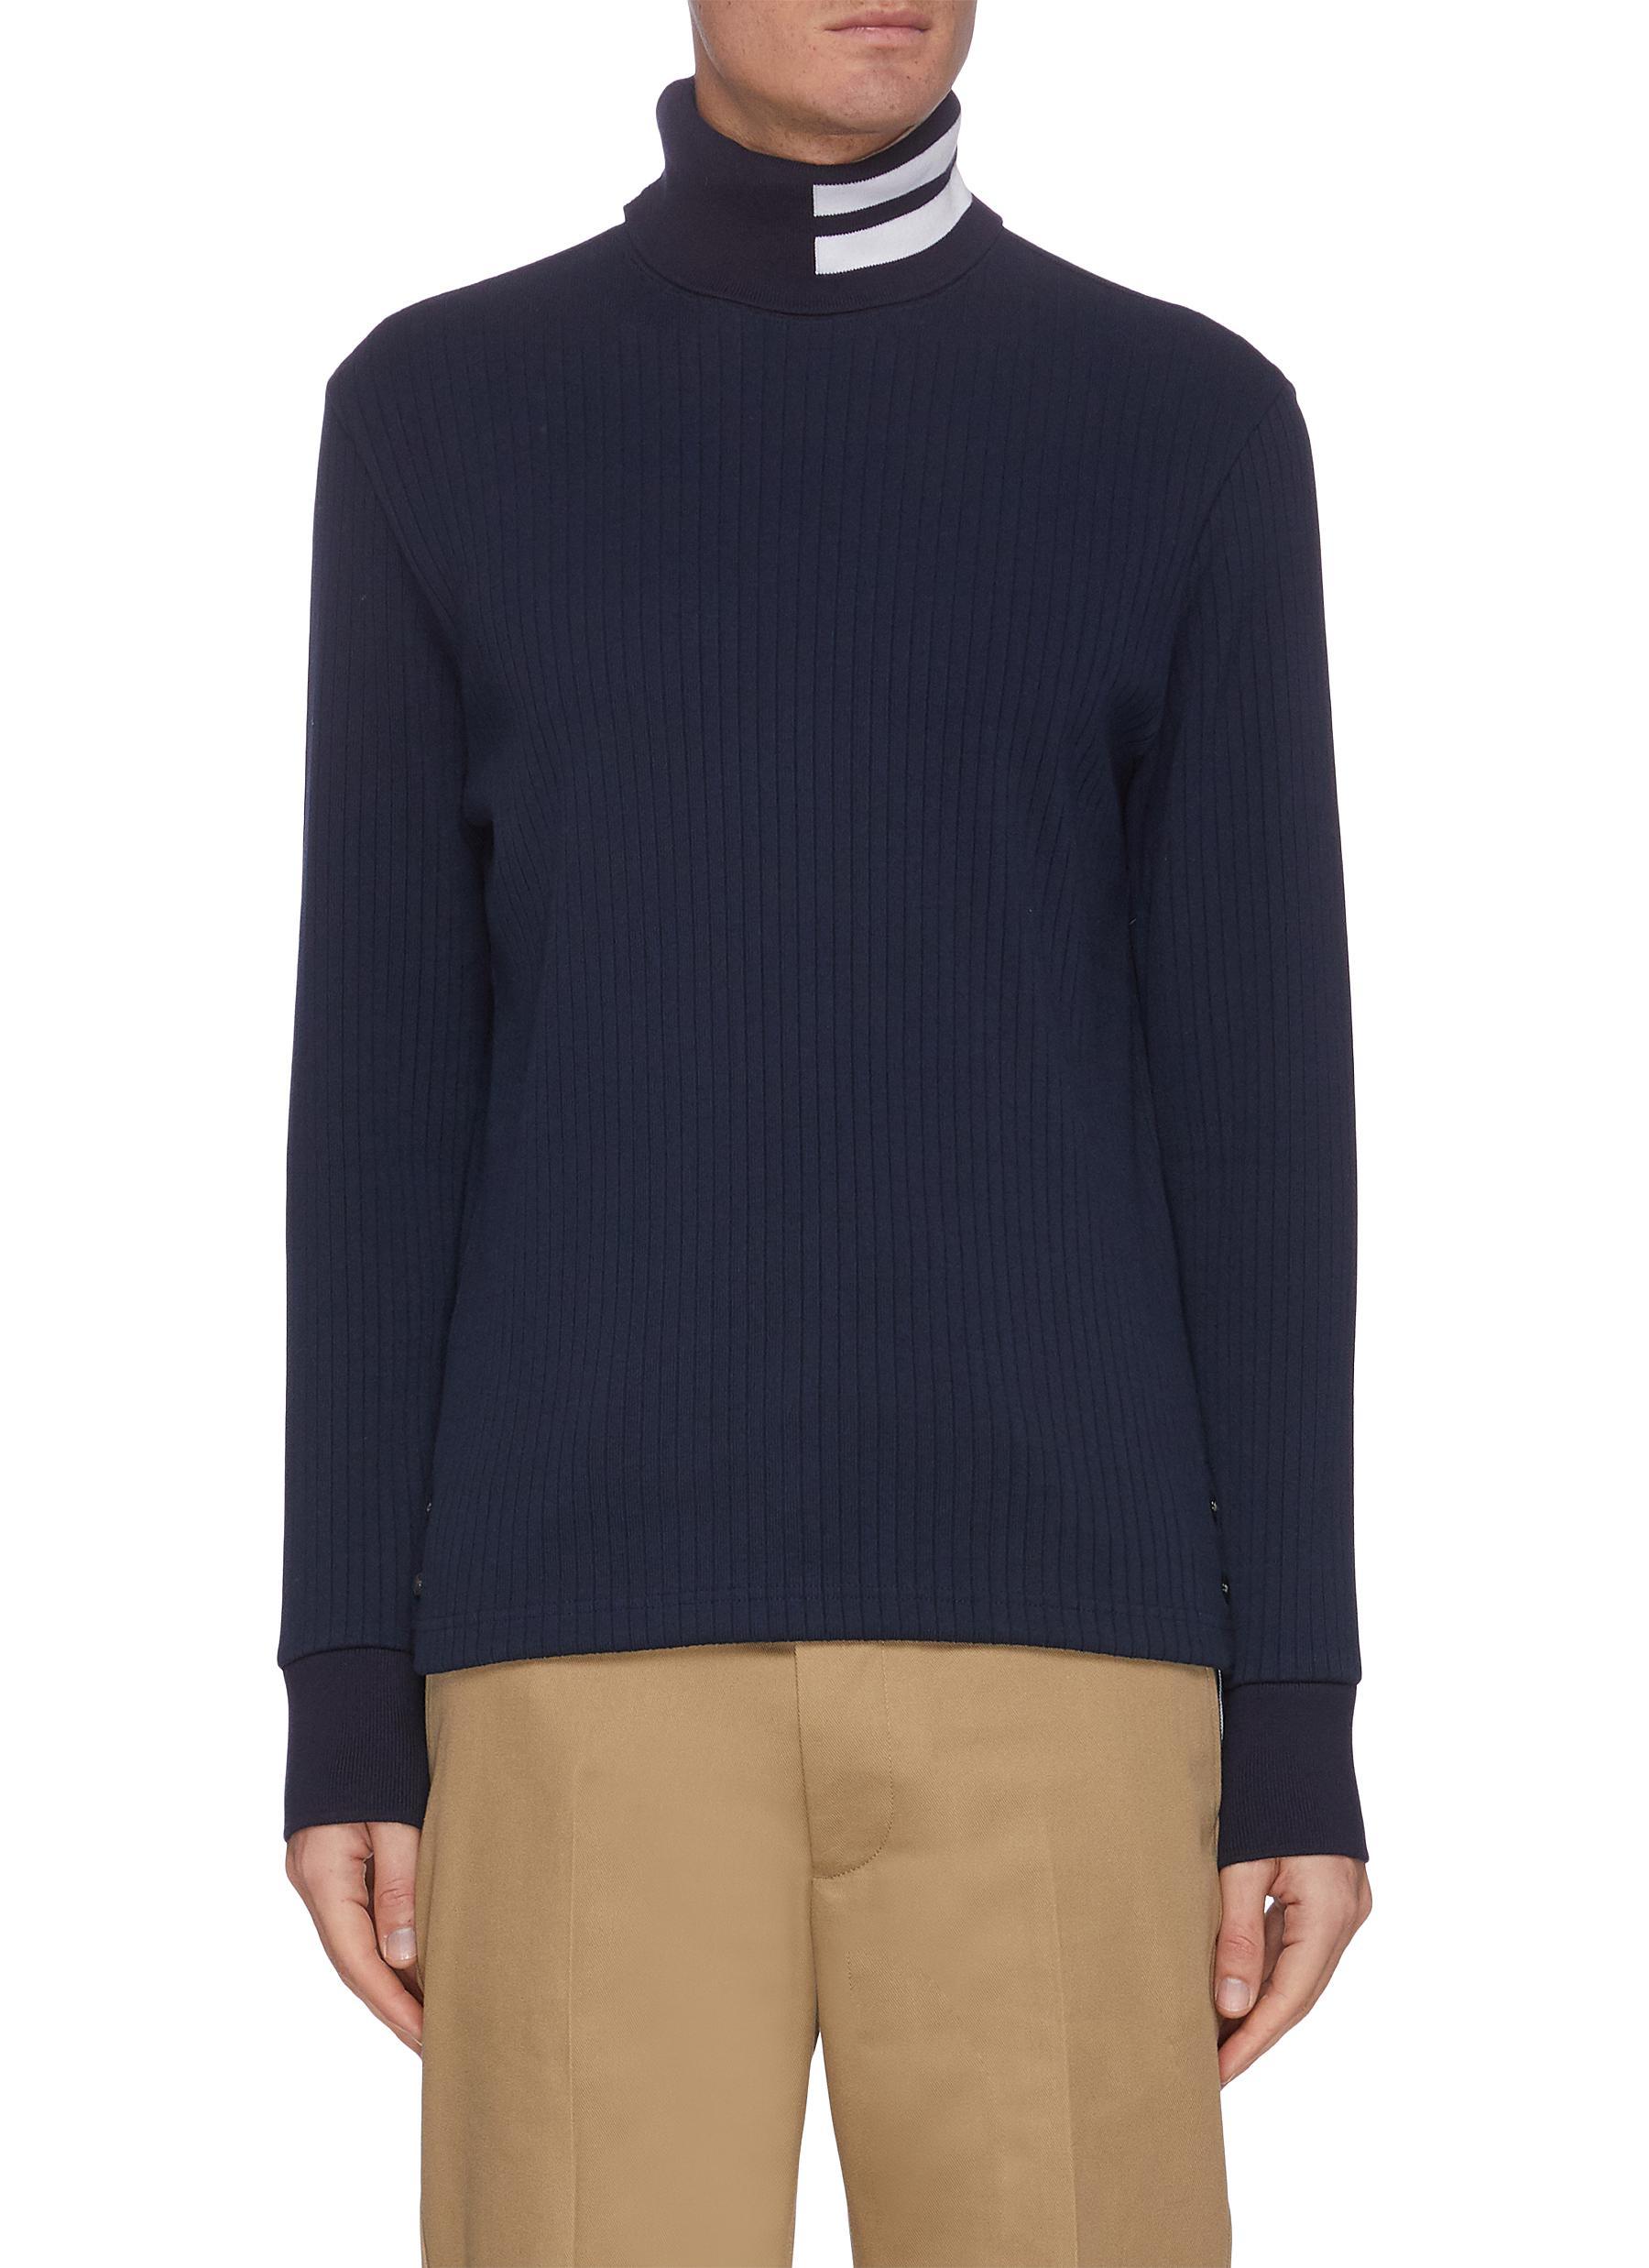 Thom Browne Sweaters STRIPE TURTLENECK RIB KNIT SWEATER